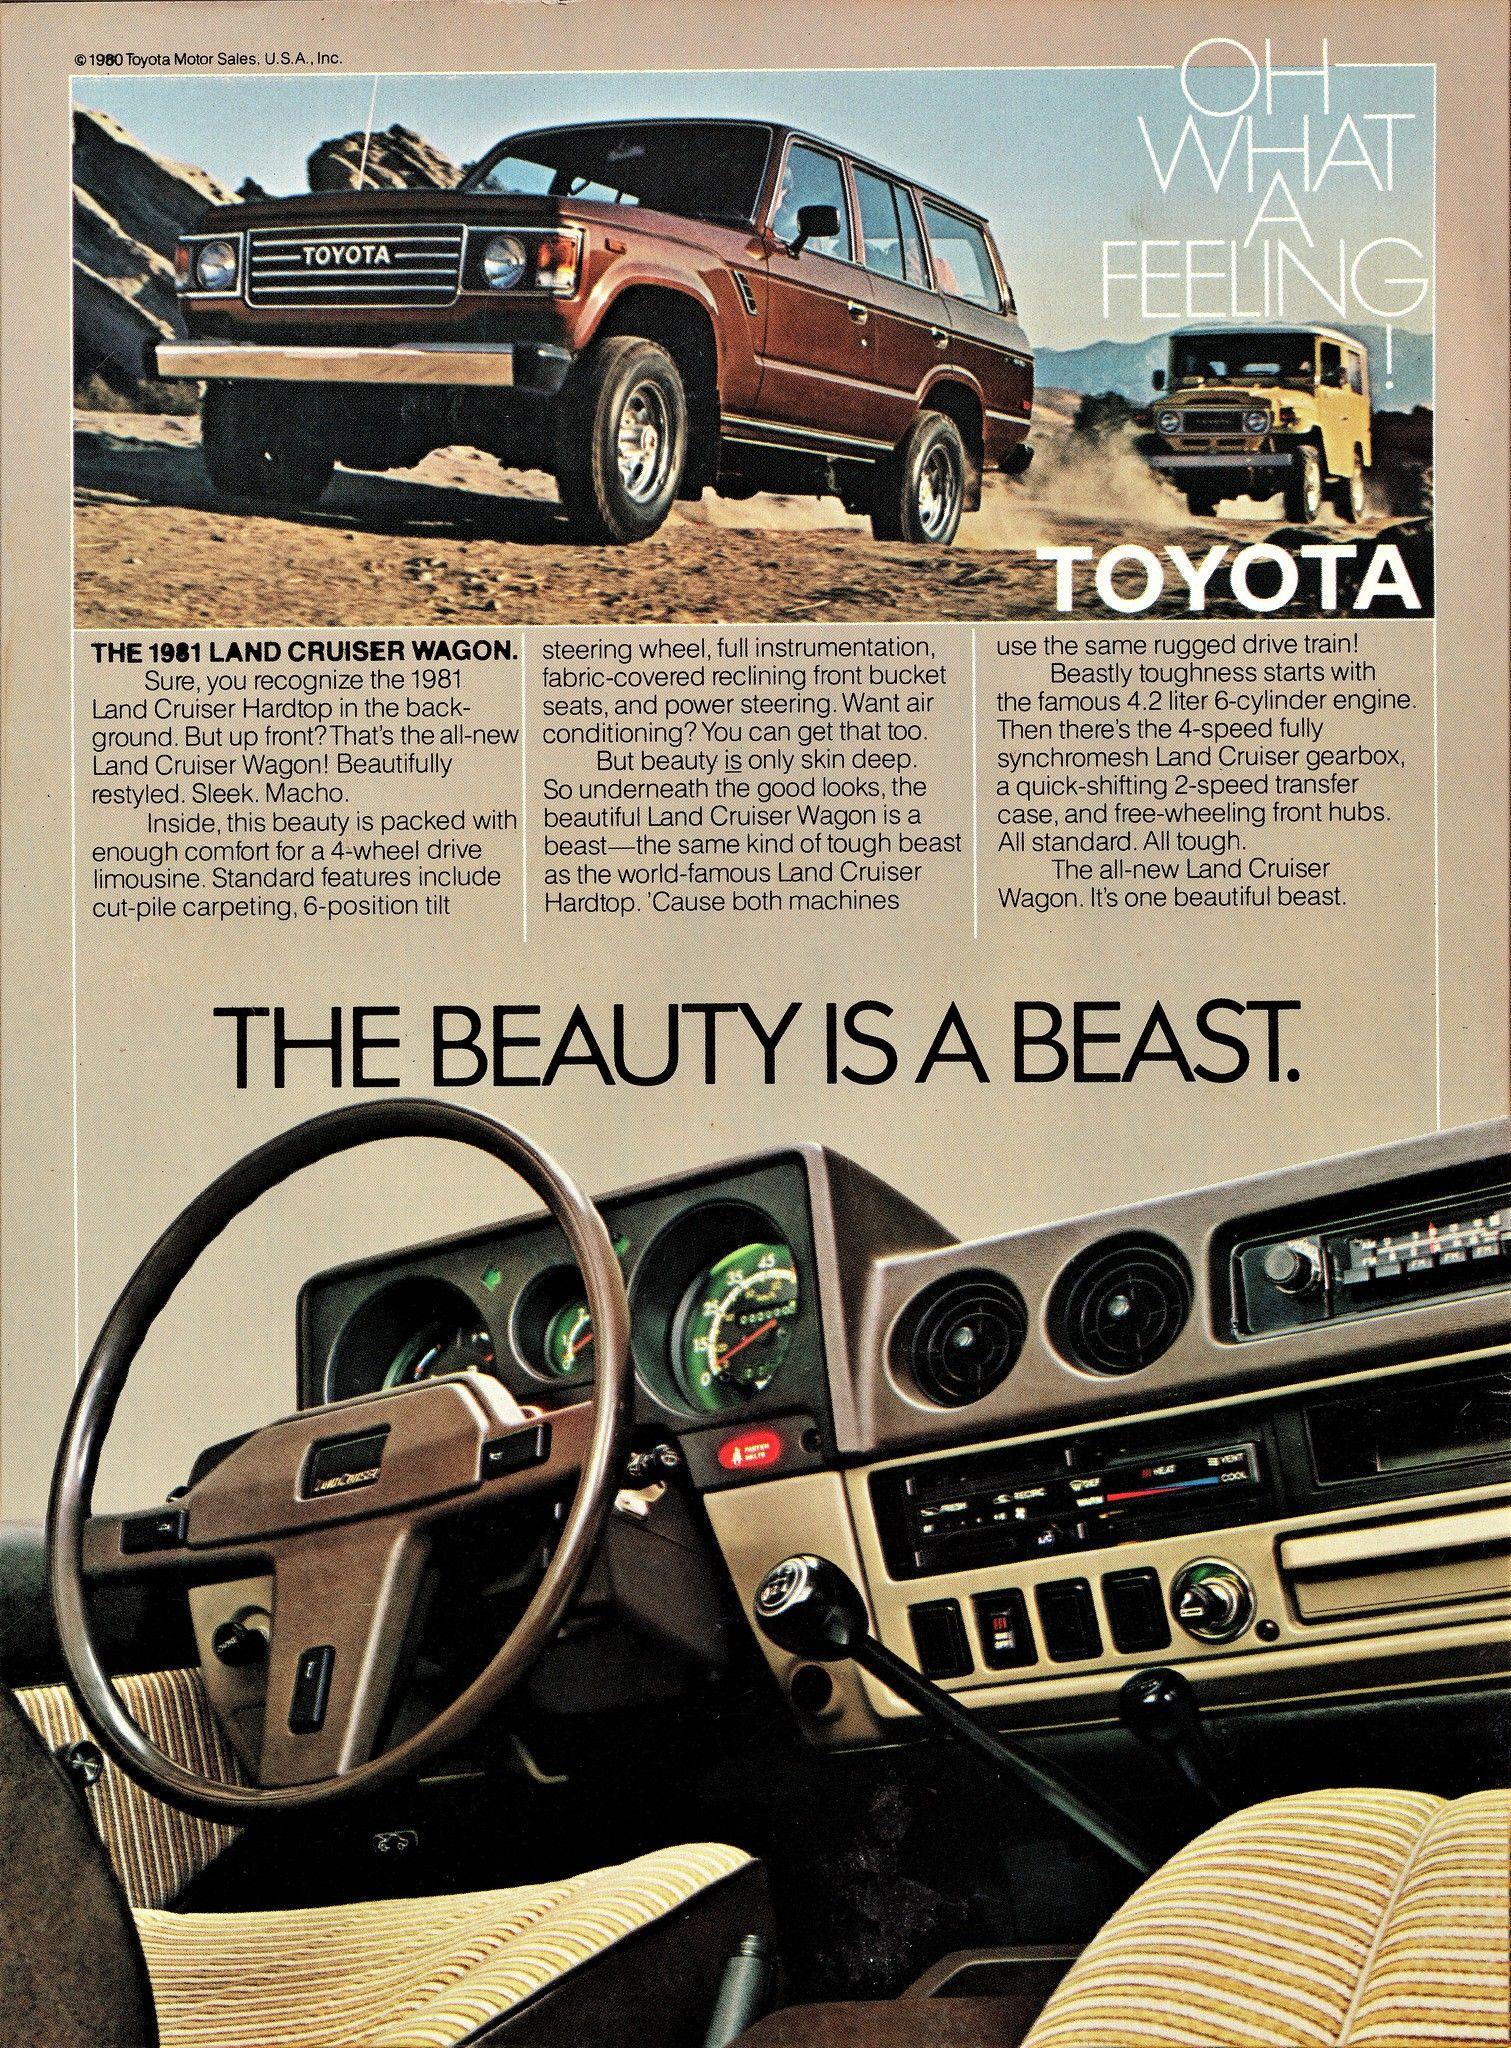 1981 Toyota Land Cruiser Wagon Hardtop In 2020 Toyota Land Cruiser Land Cruiser Toyota Cruiser